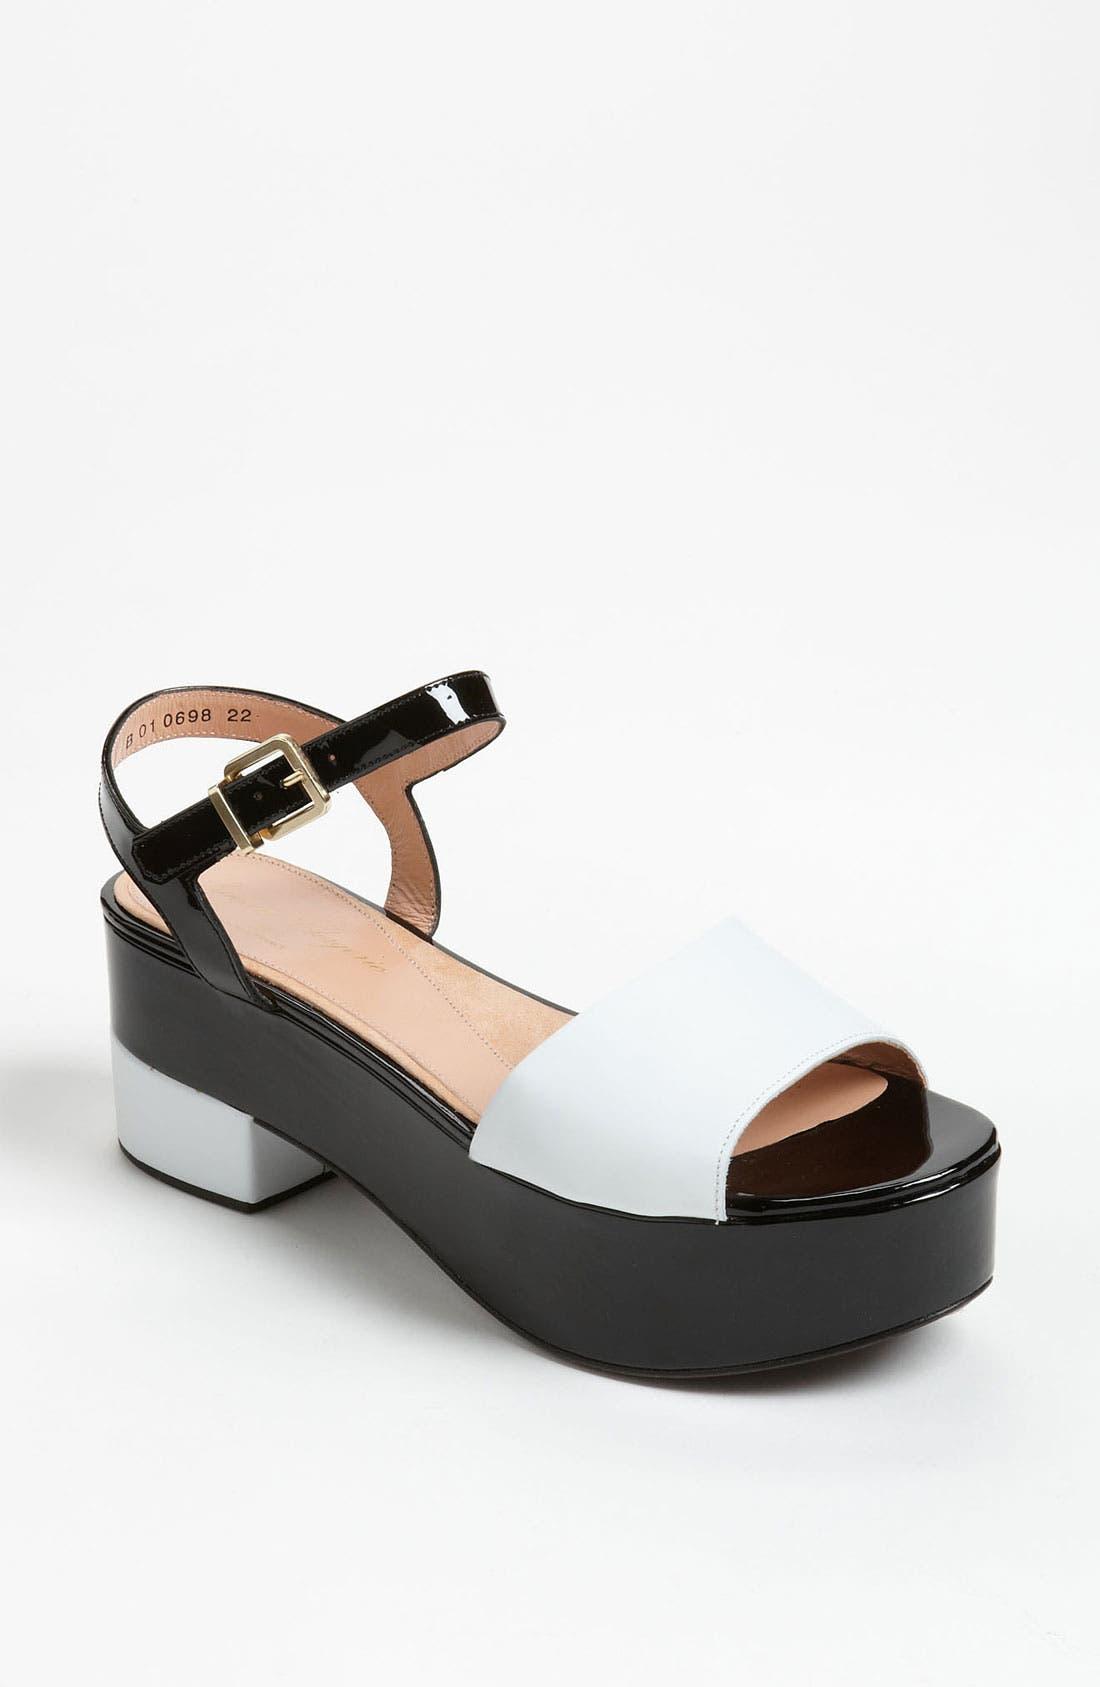 Alternate Image 1 Selected - Robert Clergerie 'Ekora' Sandal